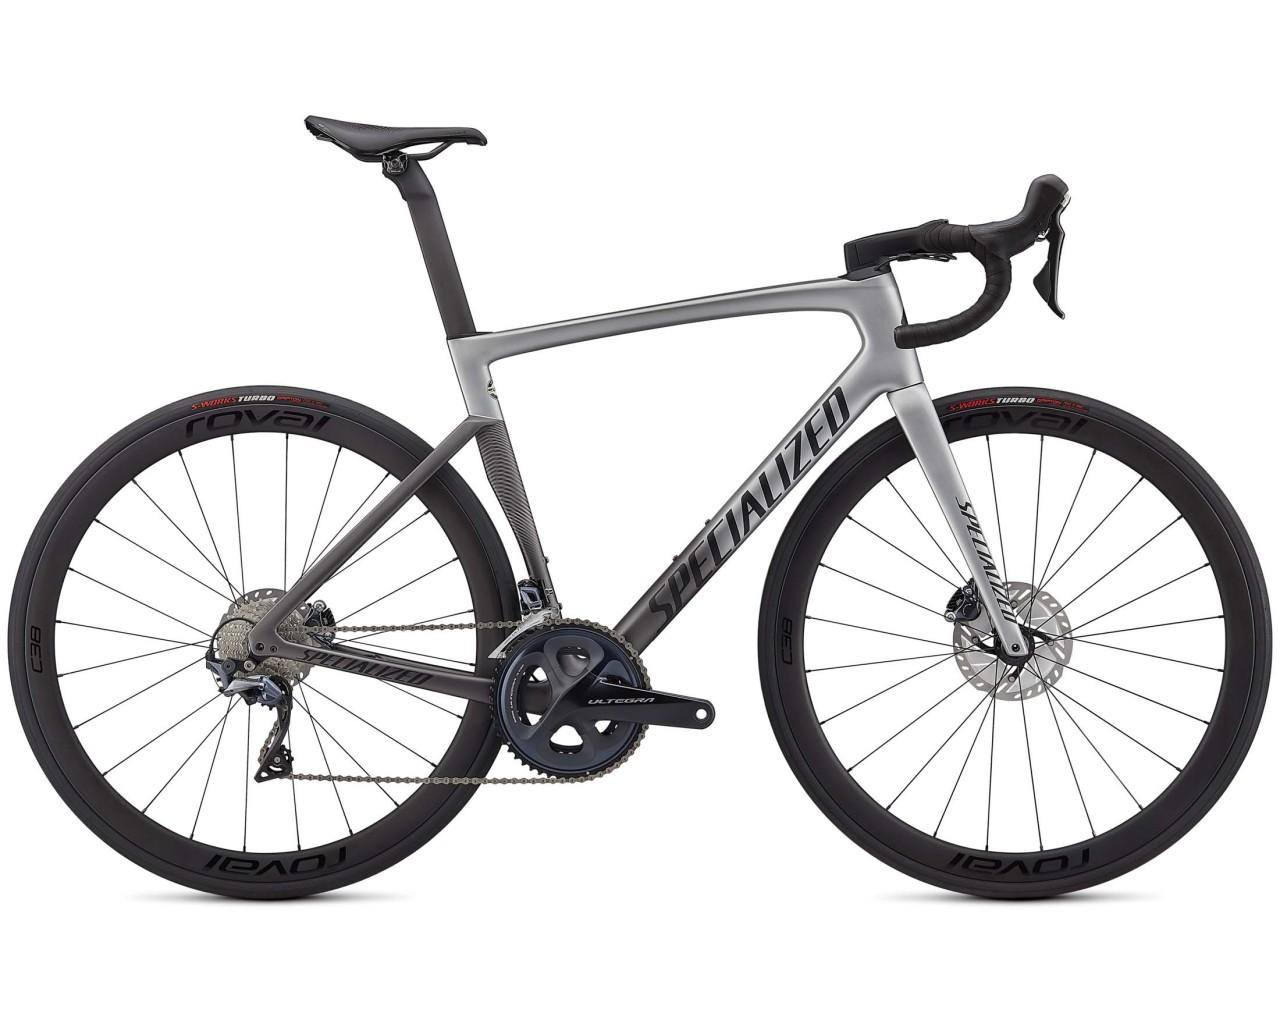 Specialized Tarmac SL7 Expert - Carbon Rennrad 2021 | light silver-smoke fade-black